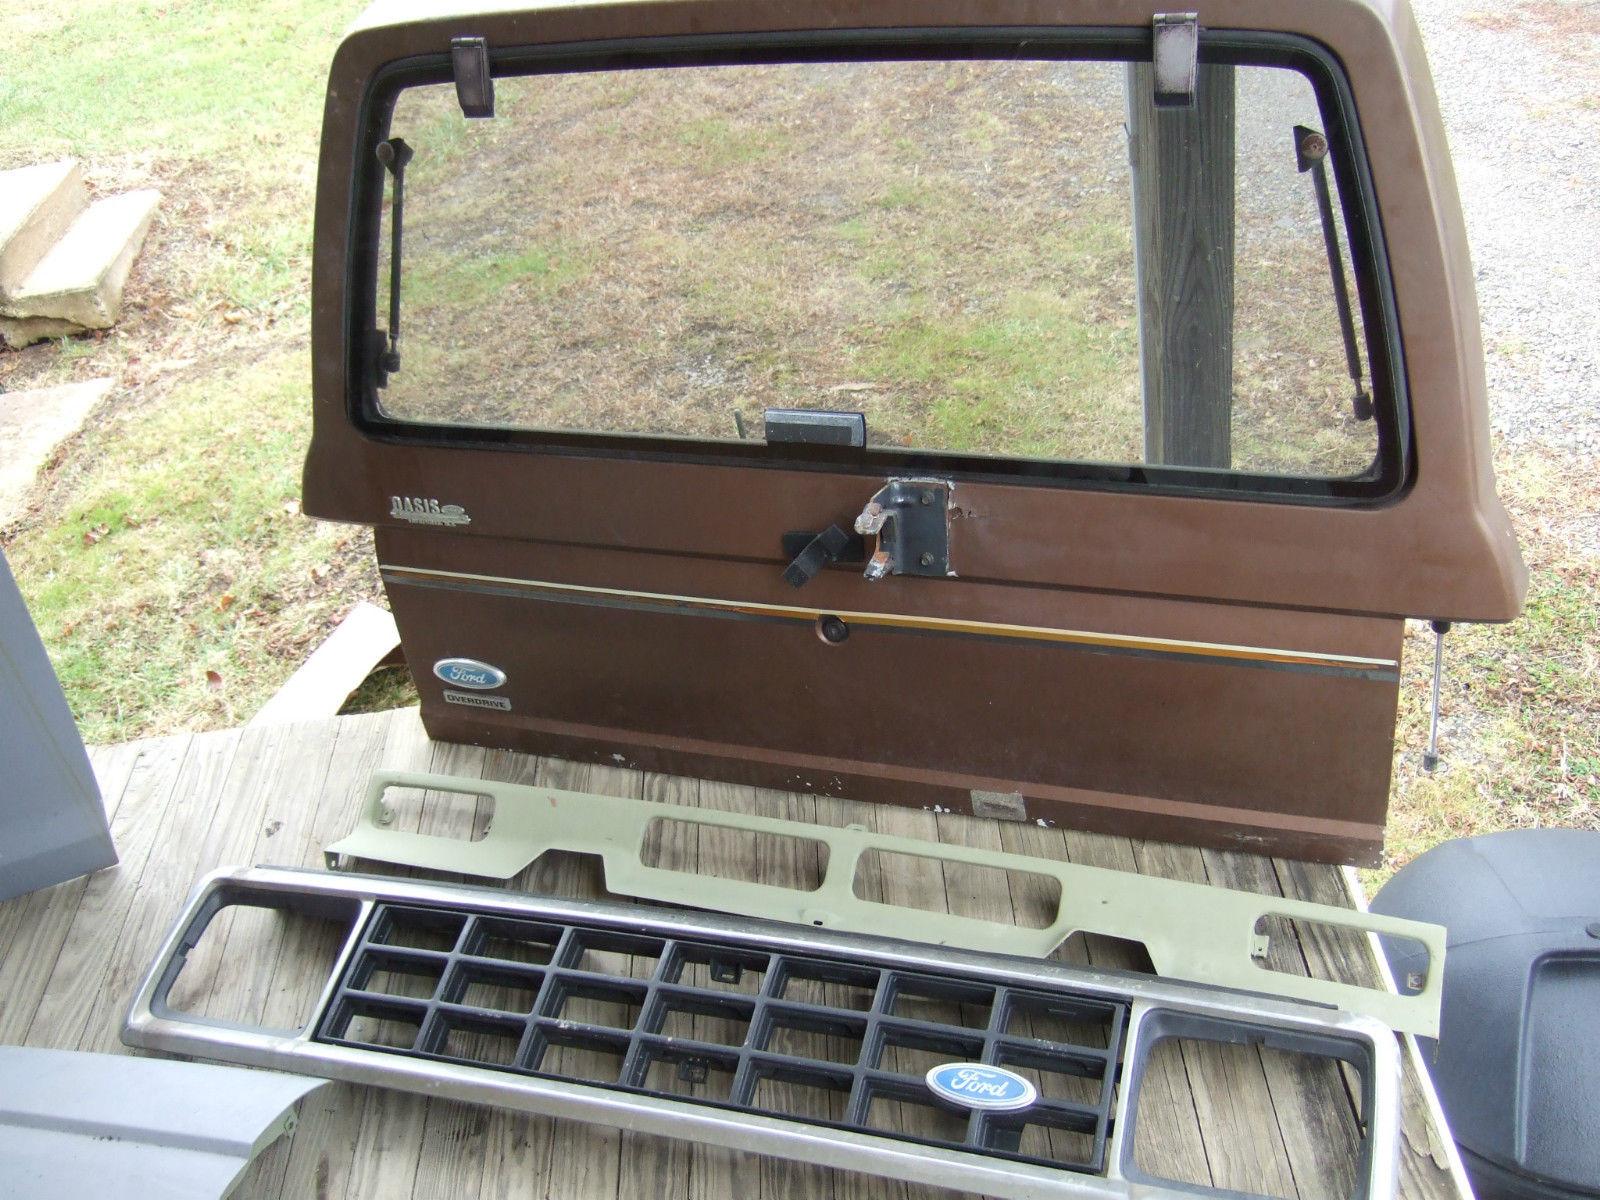 1985 Ford Bronco II Base Sport Utility 2-Door 2.8L/ 83-88 ...